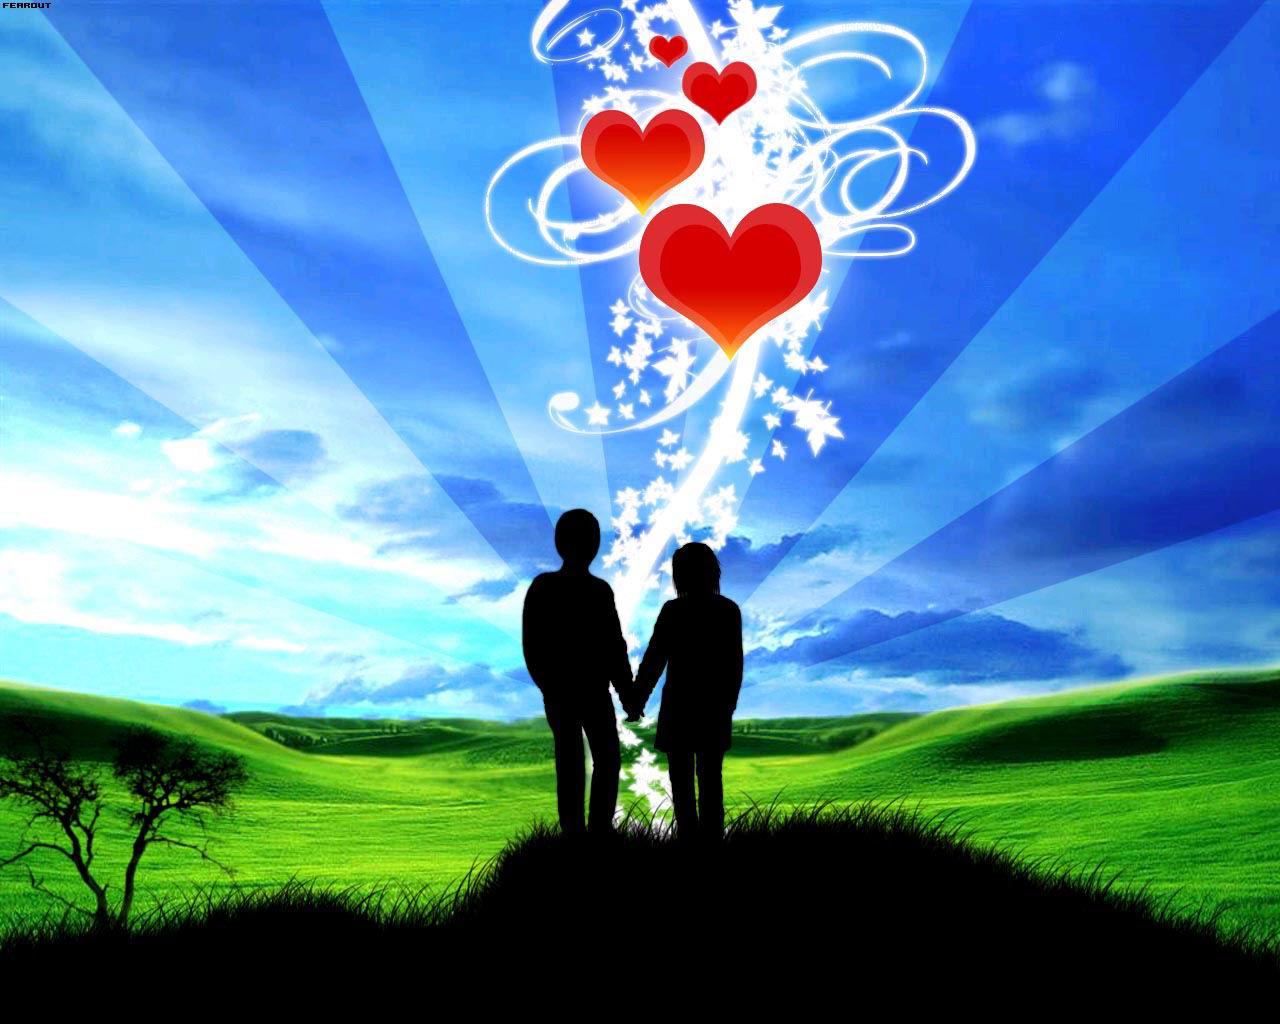 http://4.bp.blogspot.com/-23dNpXysY9A/TpfTgZIN4aI/AAAAAAAAEKg/HjjSkWnJ4jo/s1600/love_wallpaper_1111.jpg